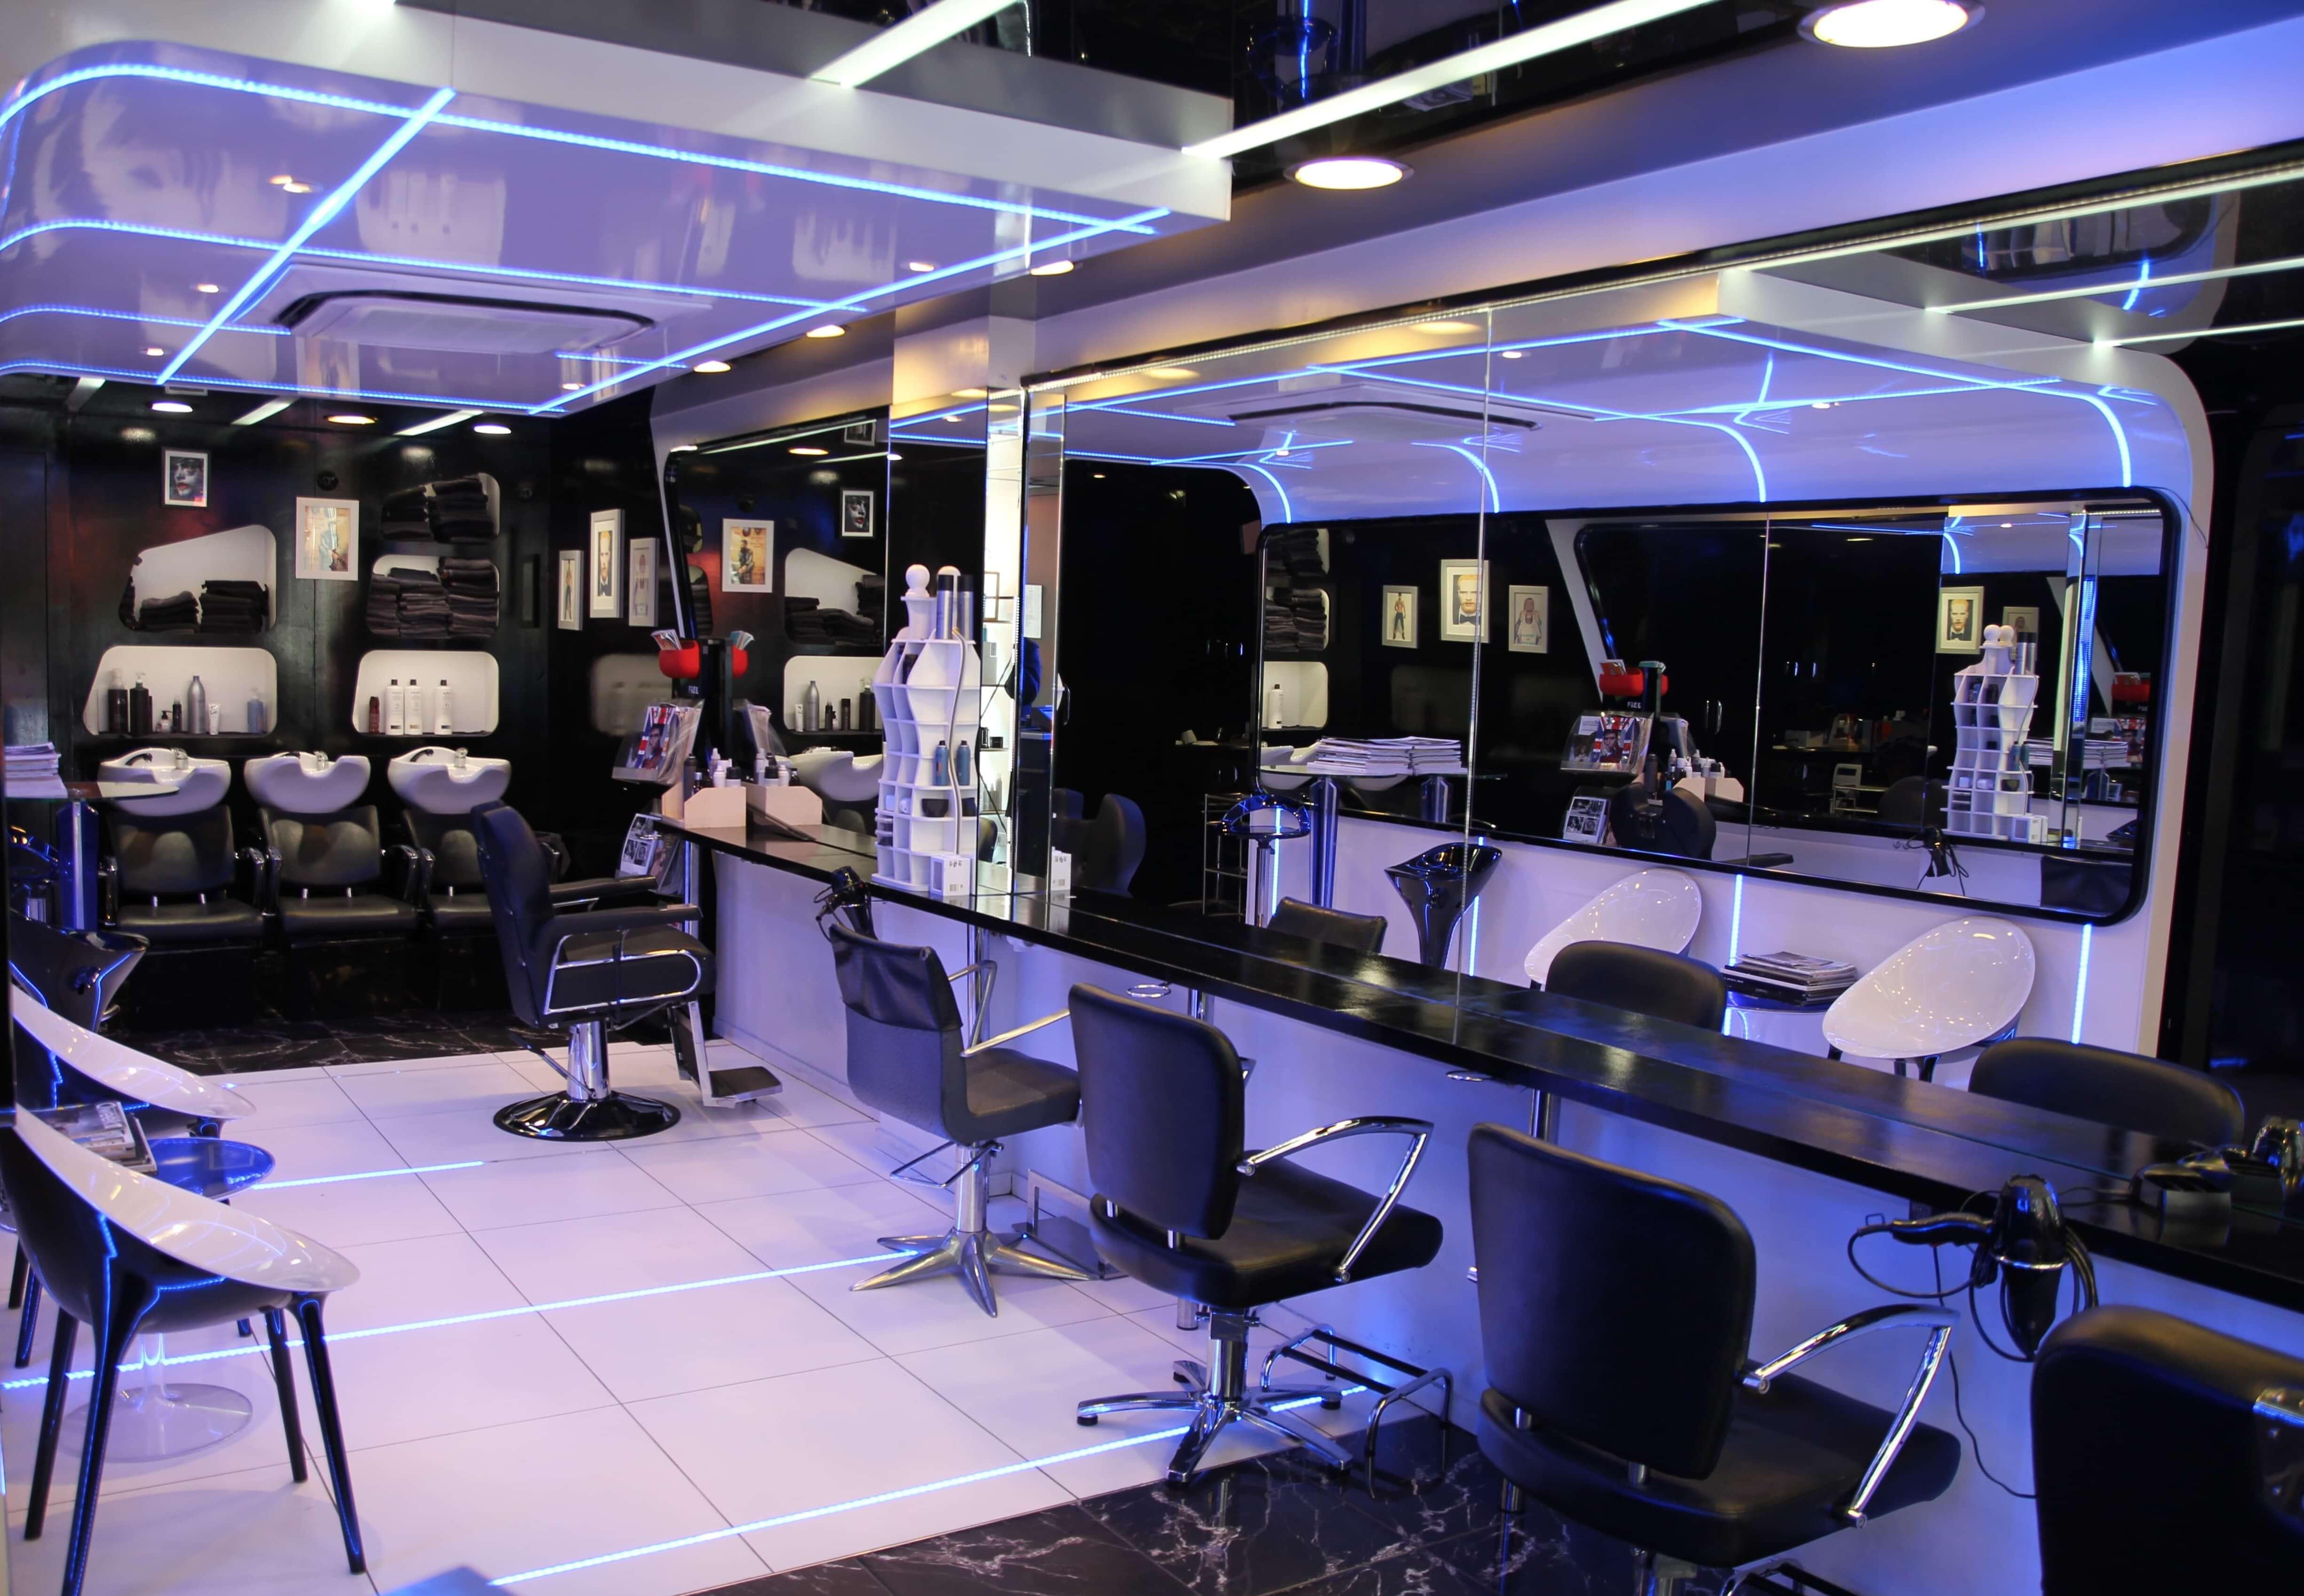 SpaceHairParis Salon de Coiffure au coeu